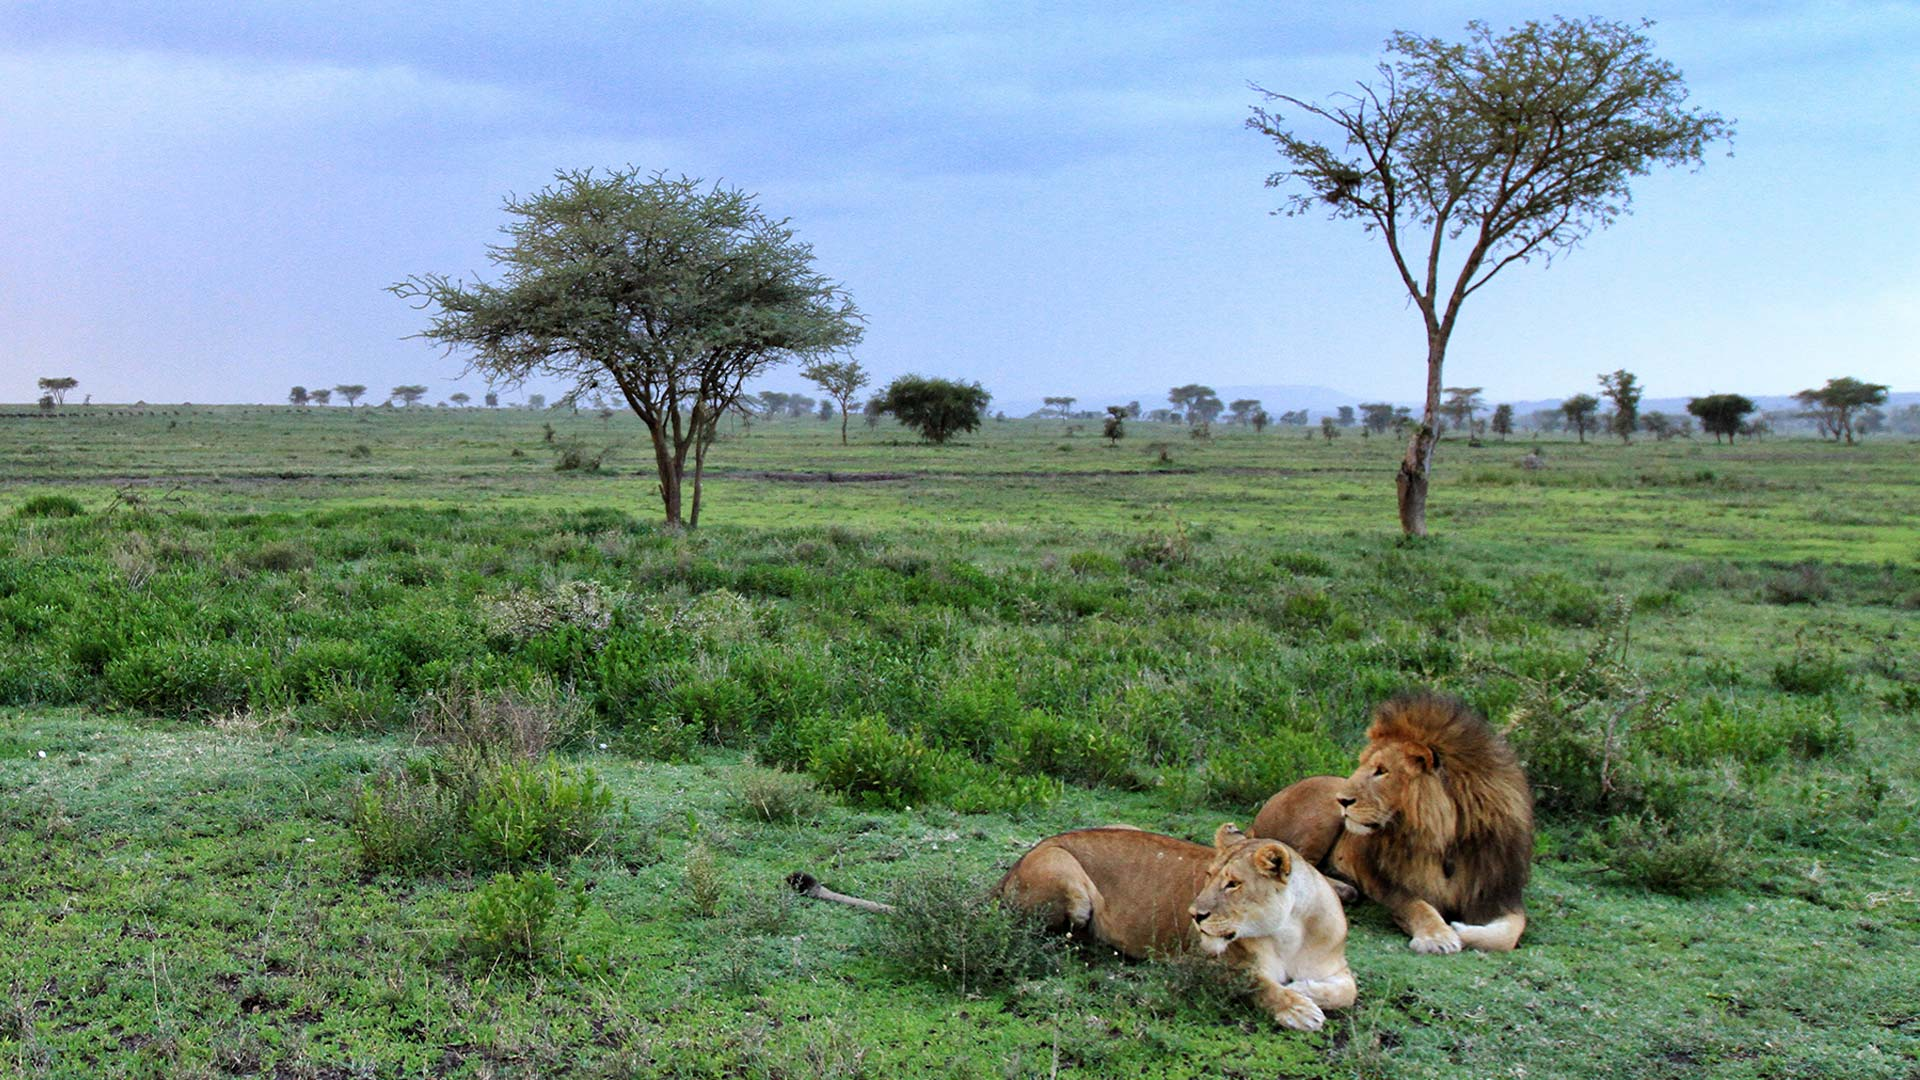 Lion pair in Serengeti